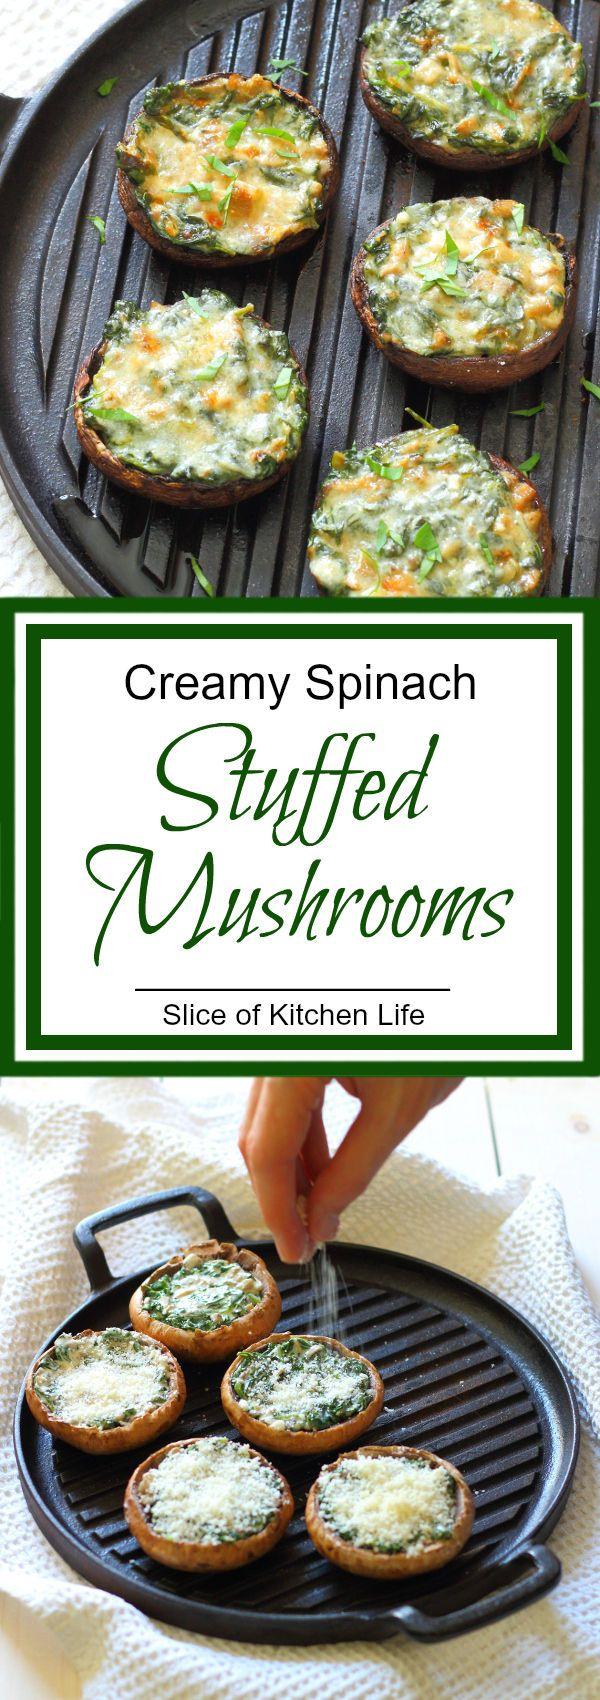 Creamy Spinach Stuffed Mushroom Recipe - Portobello mushrooms stuffed with…